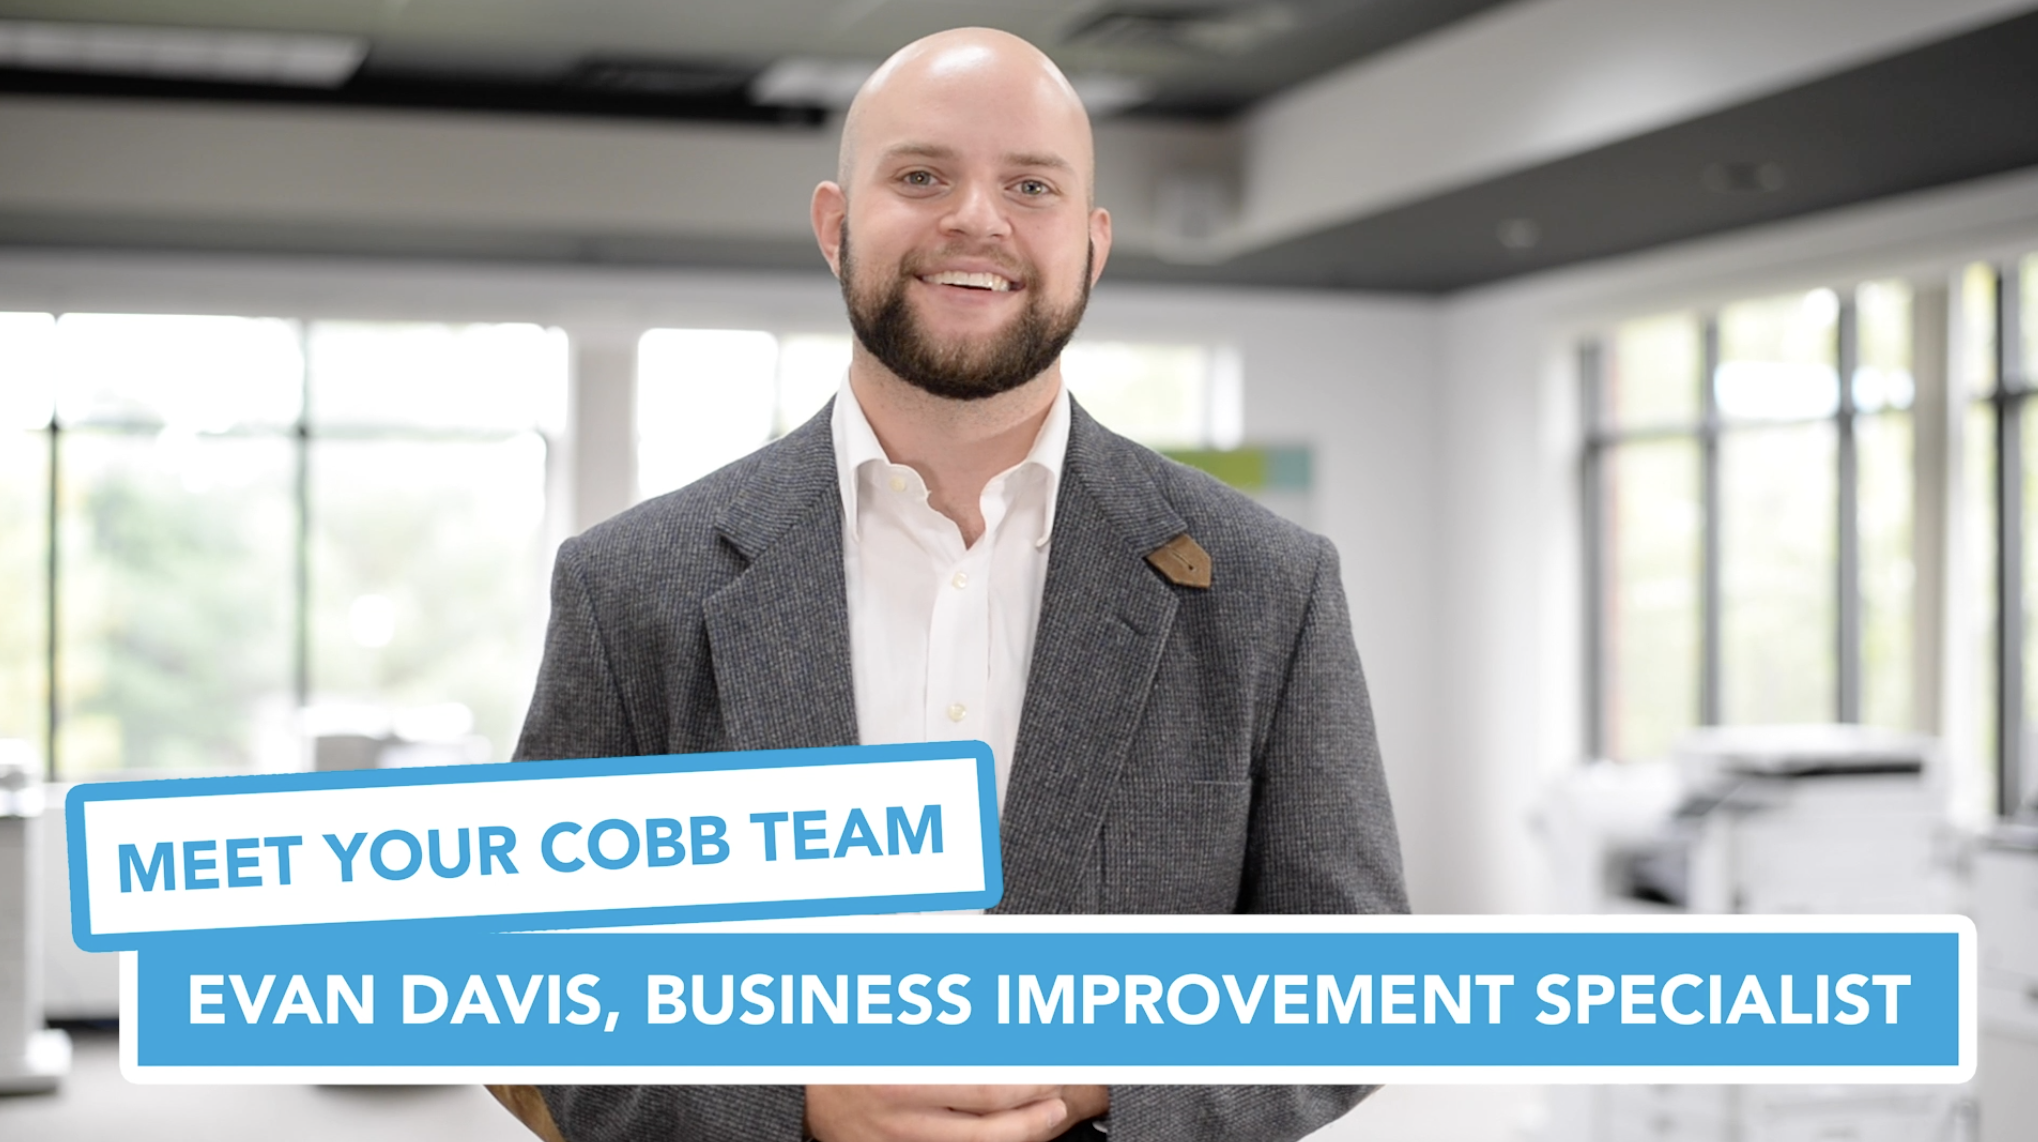 Meet Your Cobb Team: Evan Davis, Business Improvement Specialist